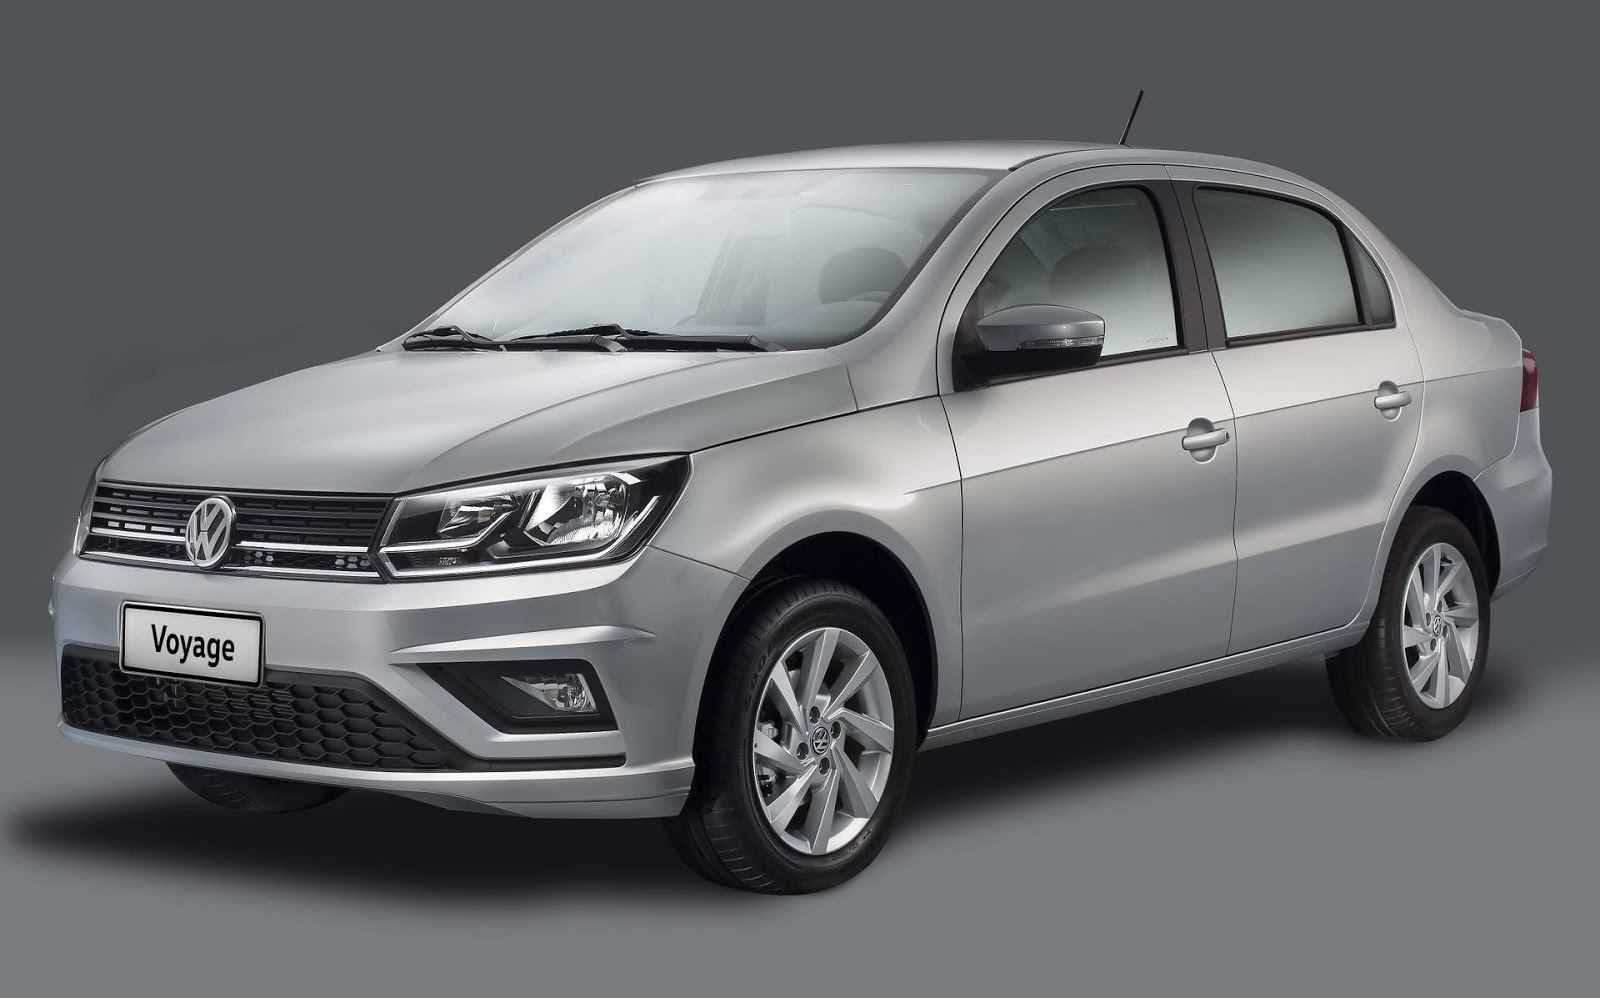 Volkswagen Voyage 1.6 MT